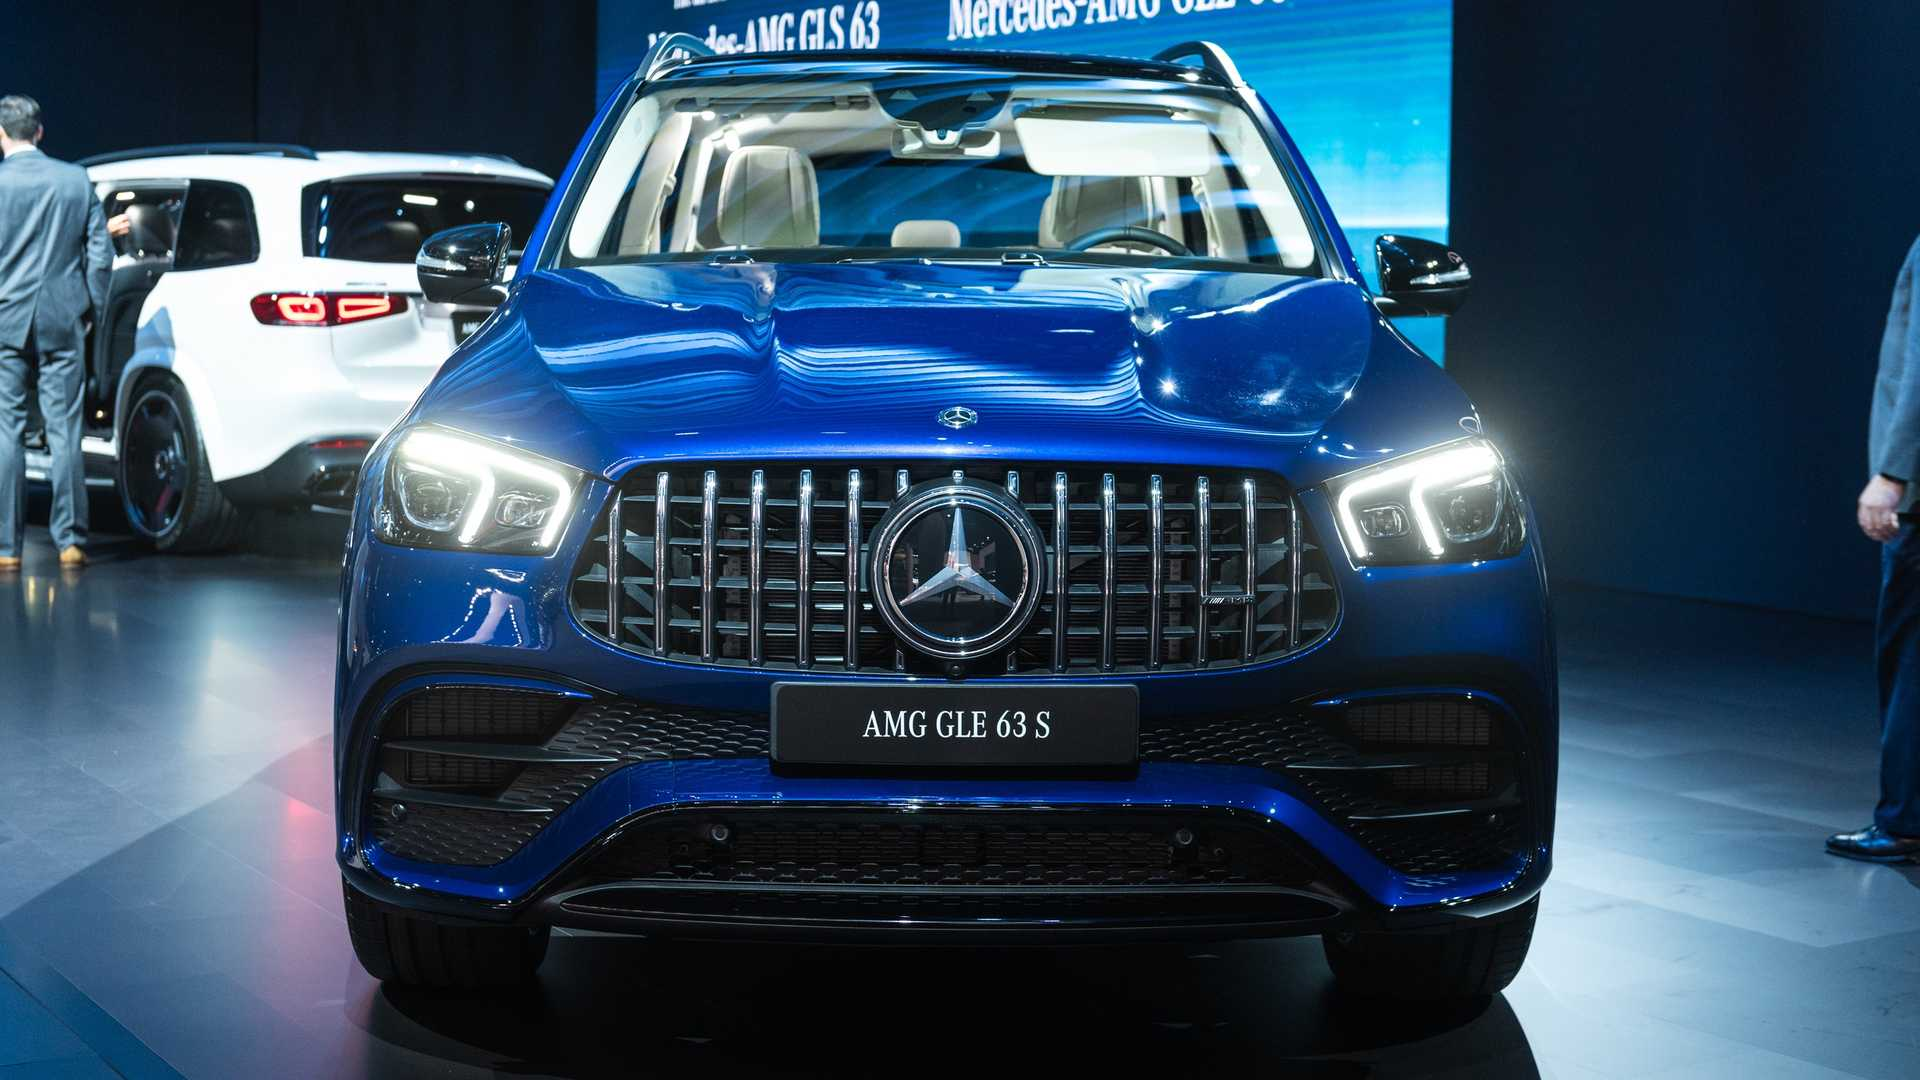 2021 Mercedes-AMG GLE 63 S Live in LA